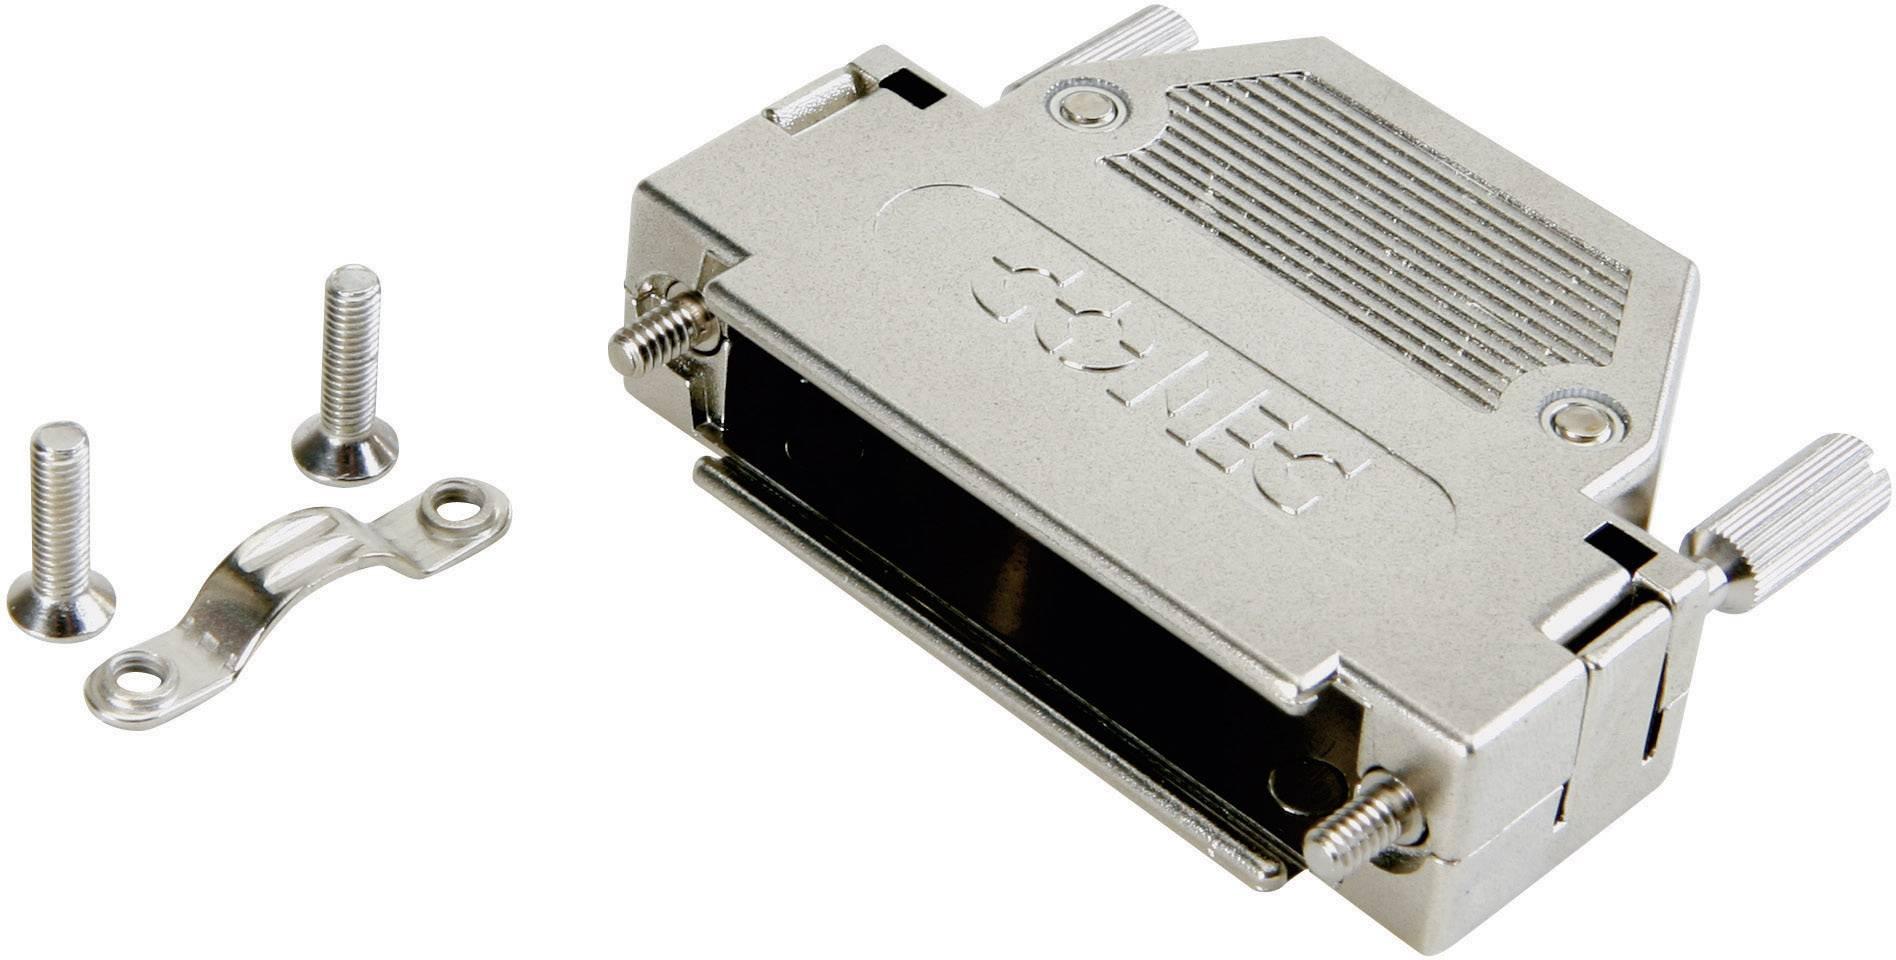 D-SUB pouzdro Conec 165X10909XE 165X10909XE, pólů 9, plast, pokovený, 180 °, stříbrná, 1 ks